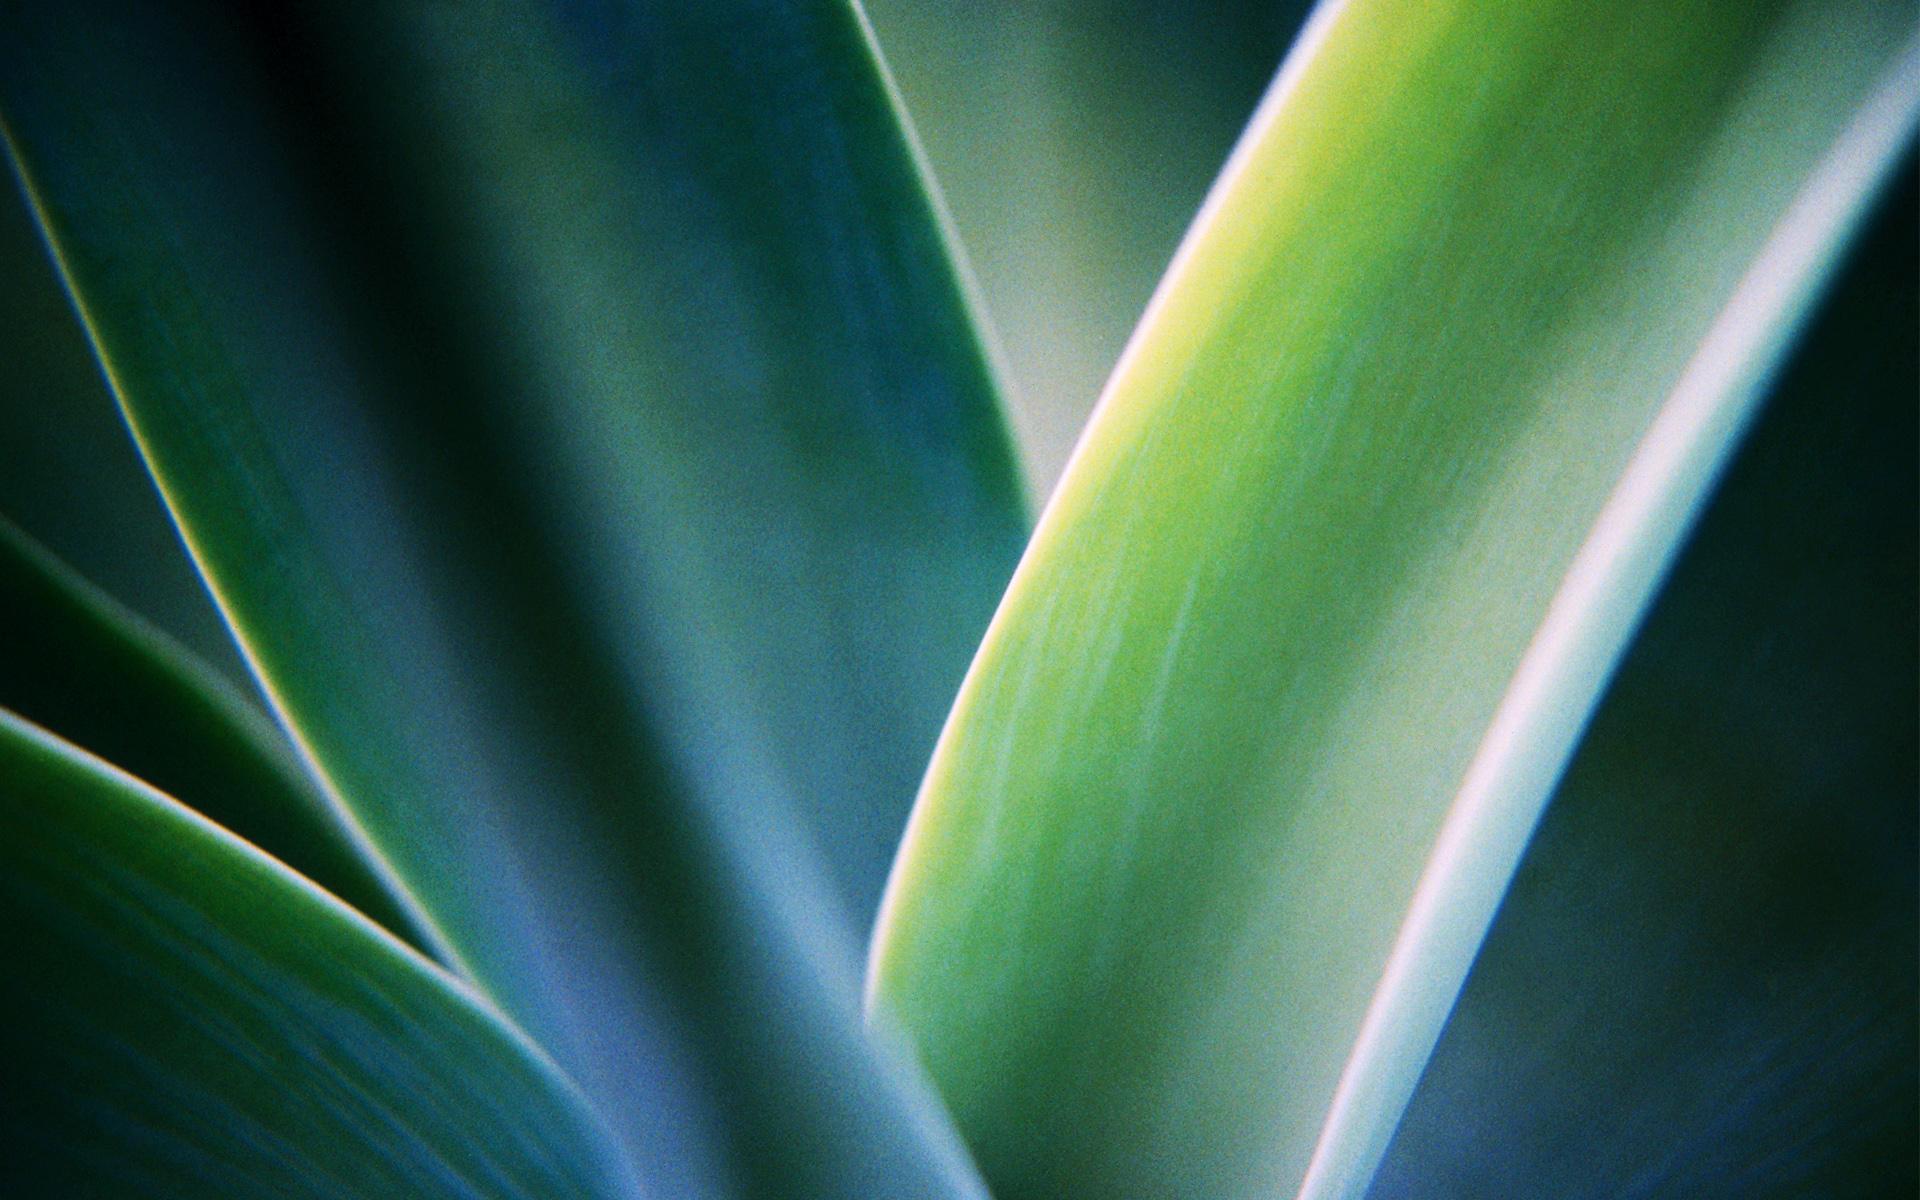 Download windows 7 exotic plant wallpaper HD wallpaper 1920x1200